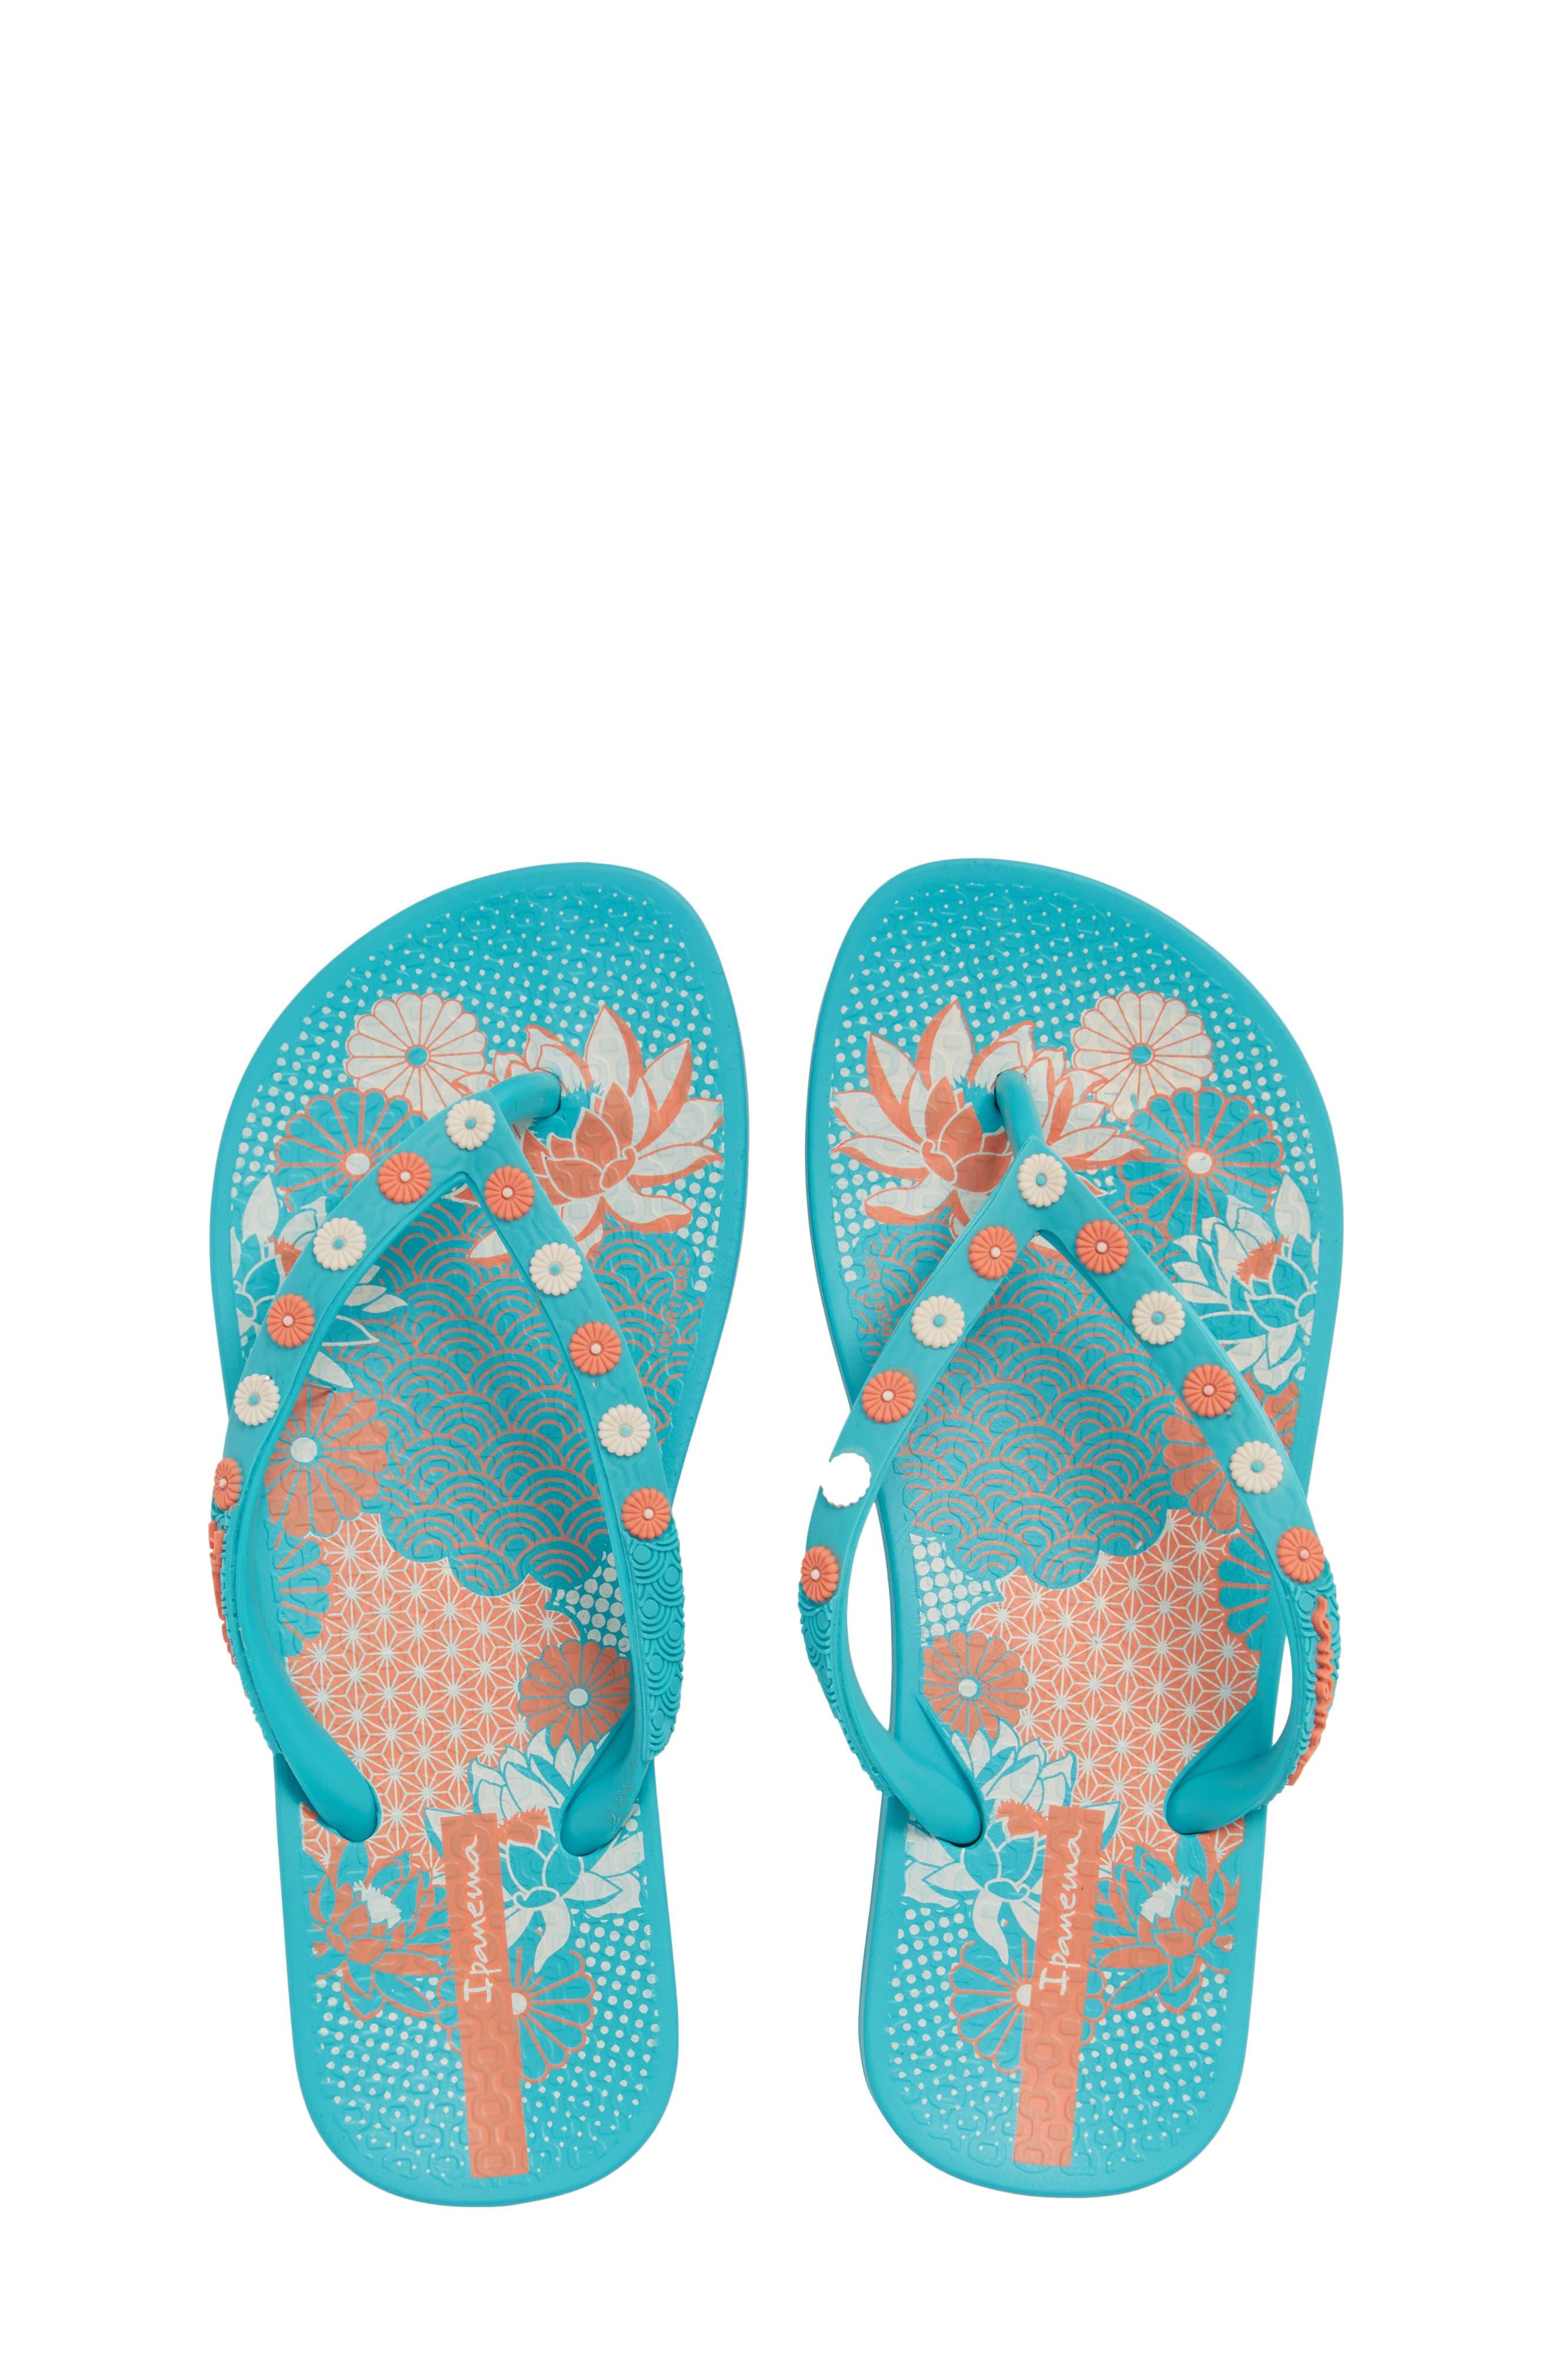 Ana Lovely Flip Flop,                         Main,                         color, Blue